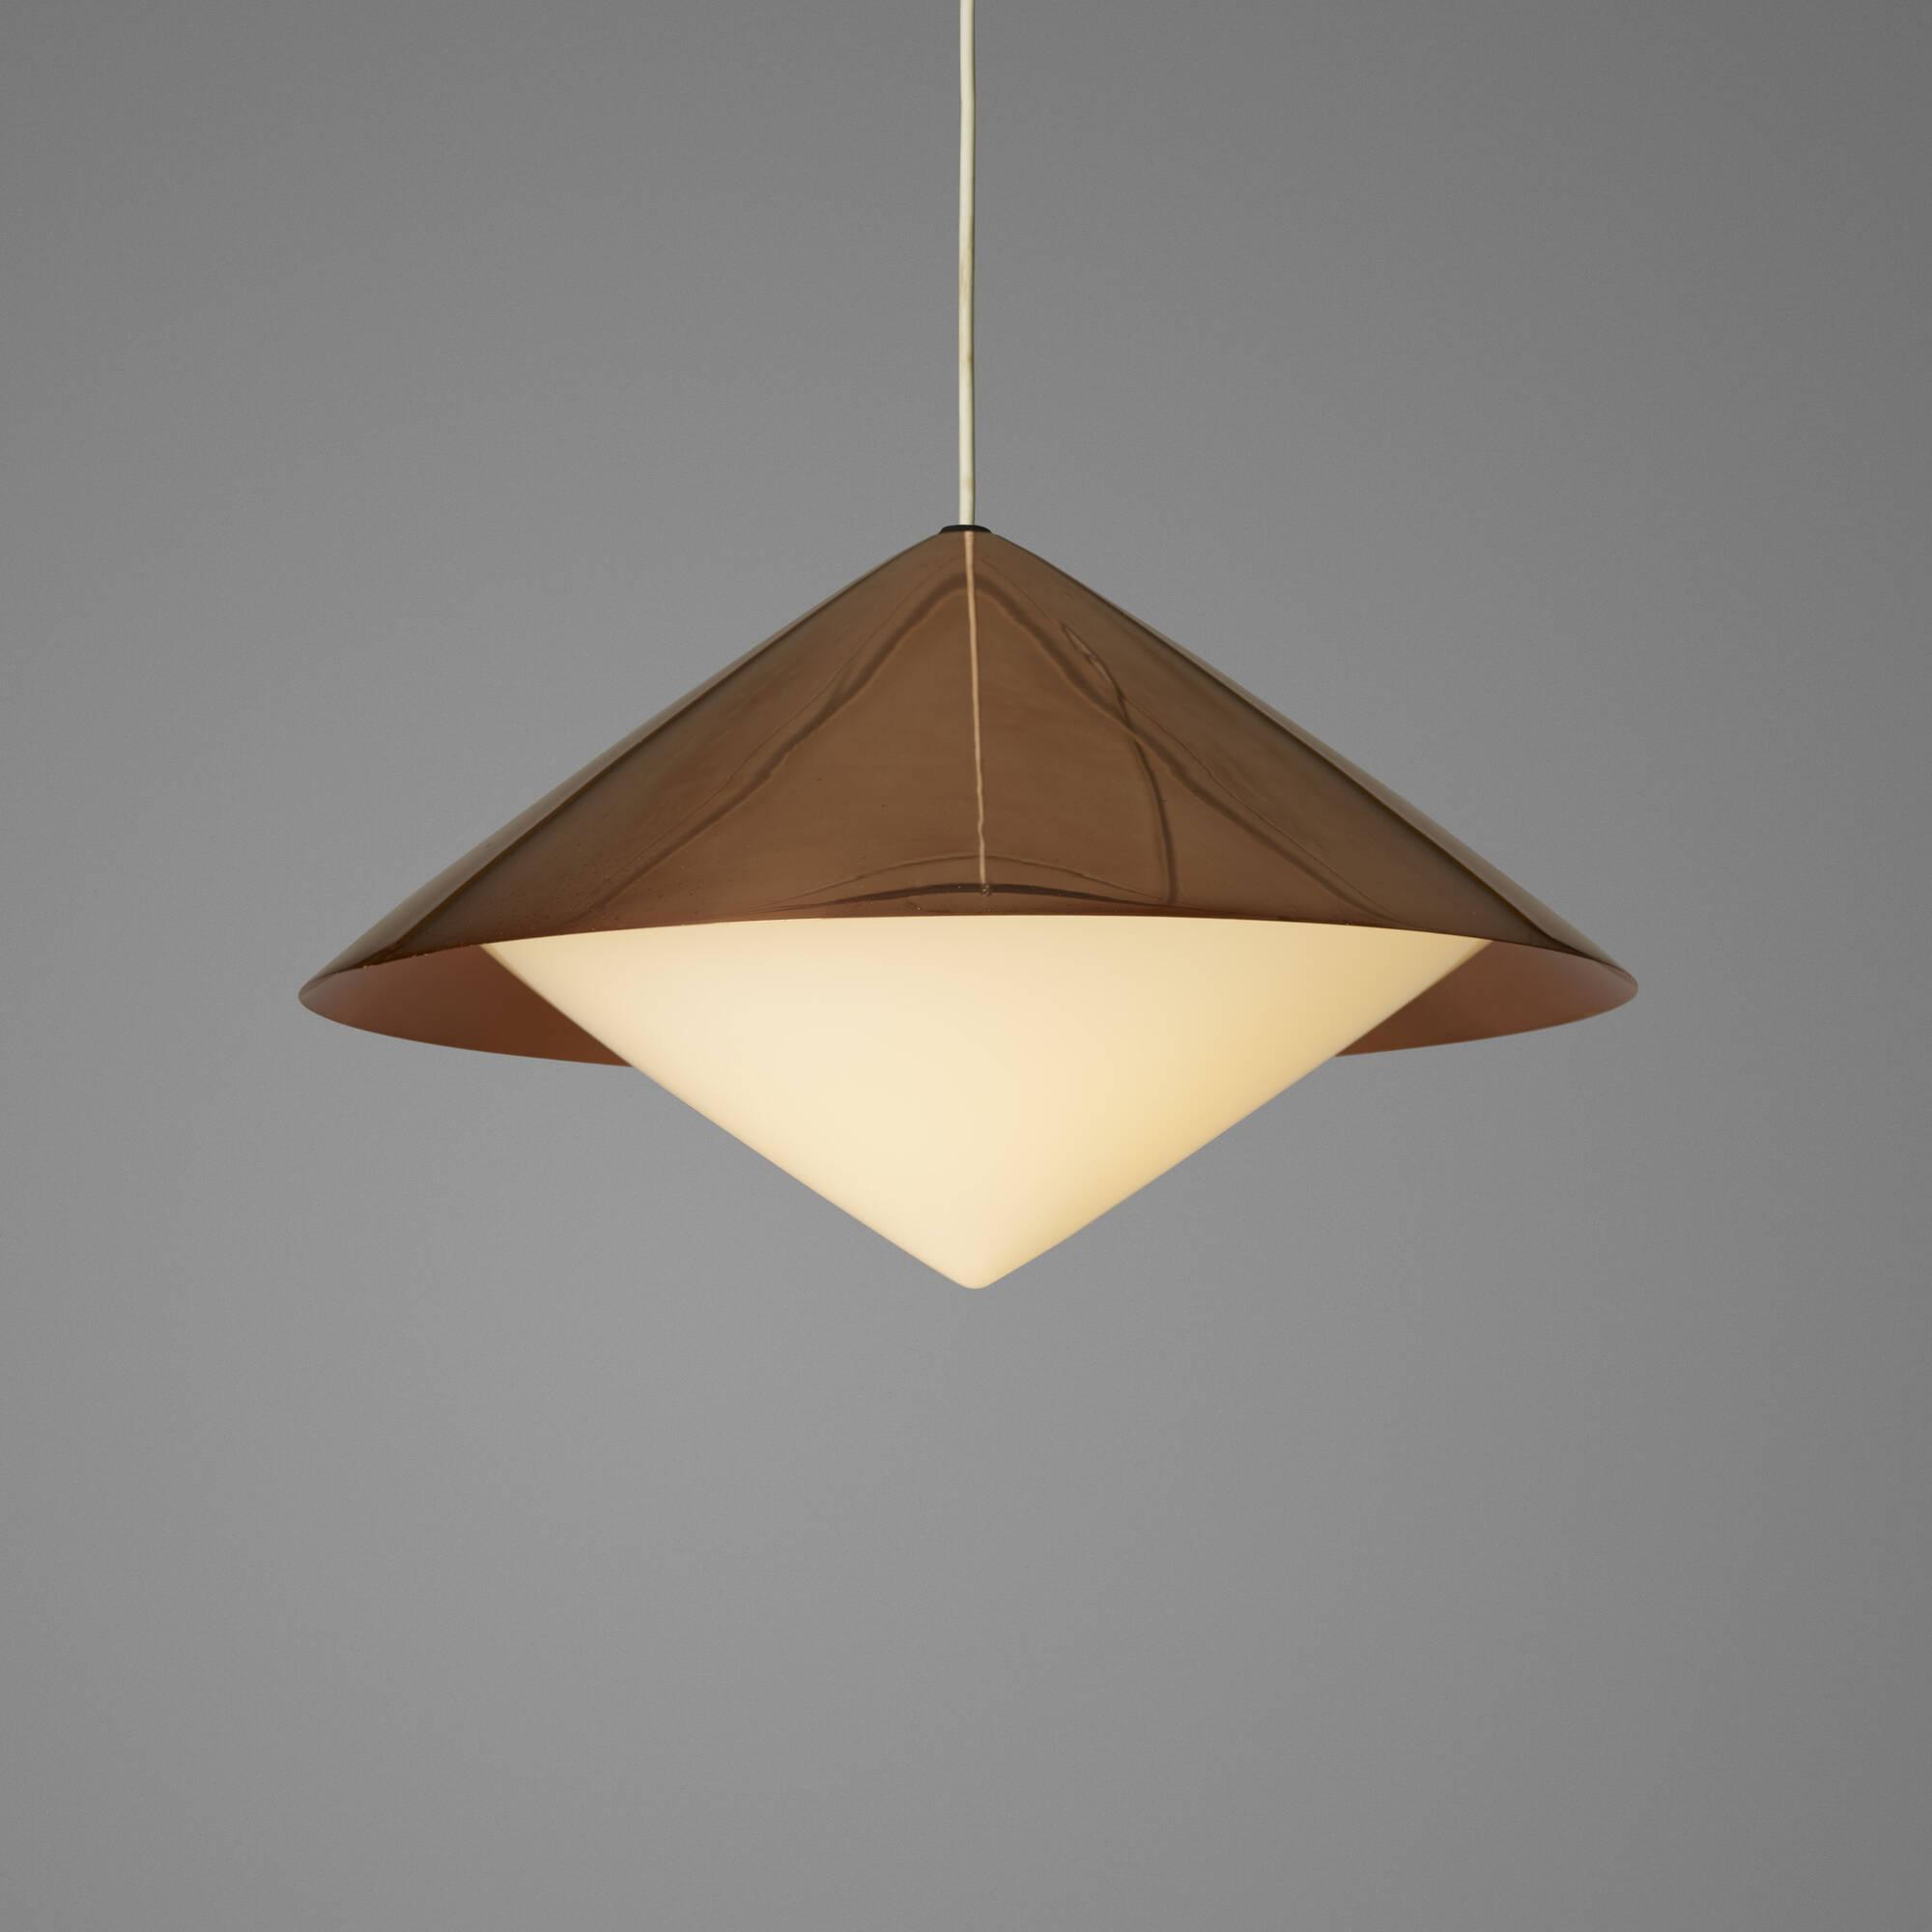 245 svea winkler pendant lamp scandinavian design 30 november 245 svea winkler pendant lamp 1 of 2 arubaitofo Images